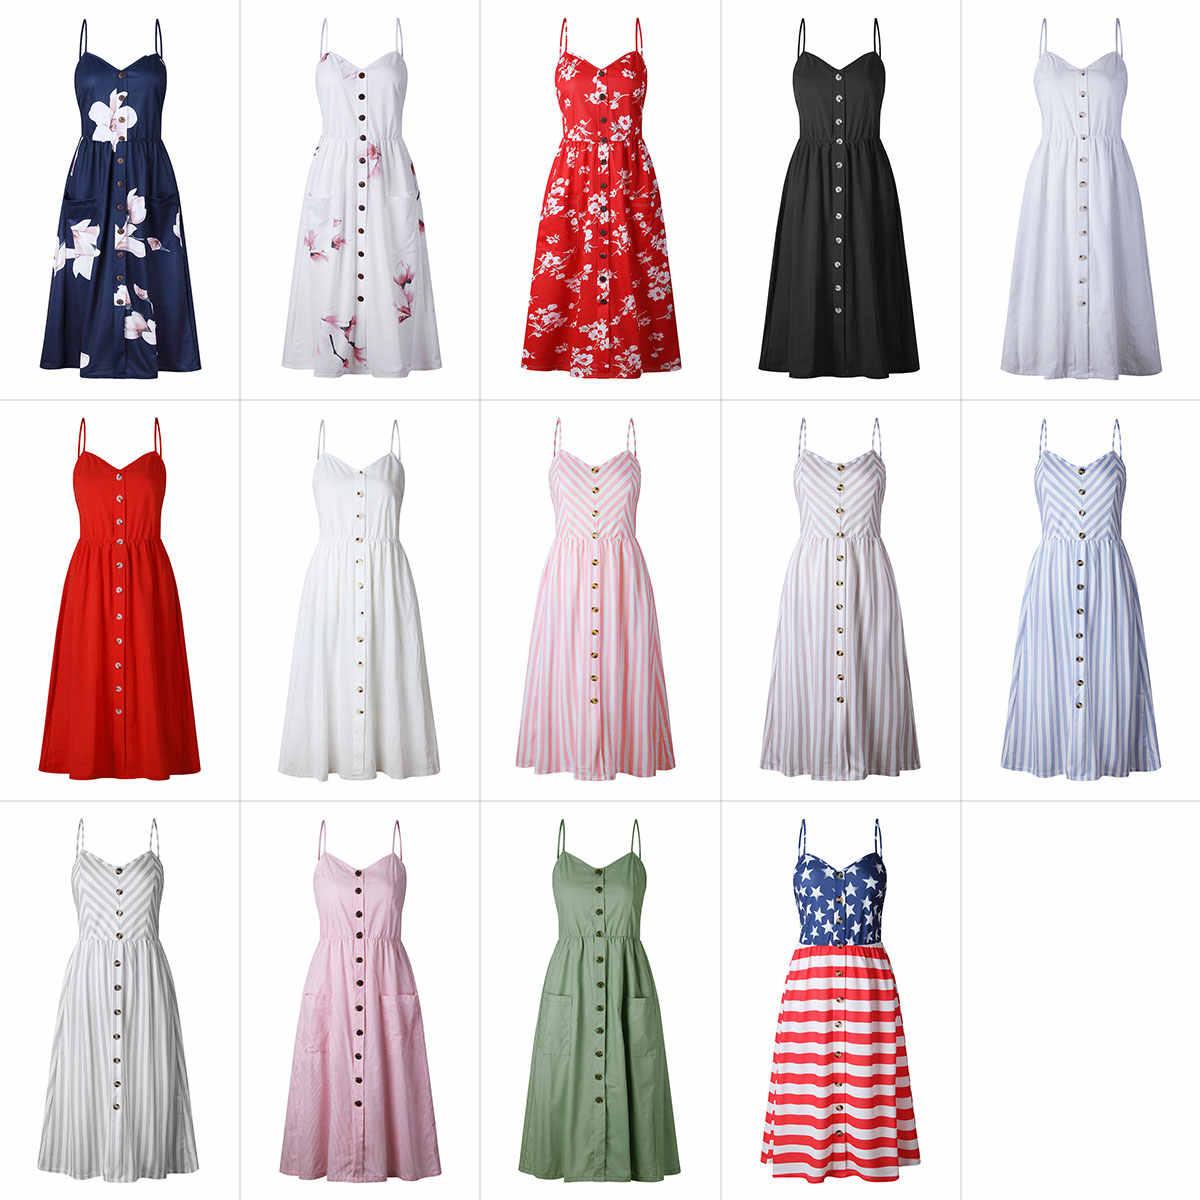 2f6ba8ea49931 2019 Summer Women Button Decorated Print Dress Off-shoulder Party Beach  Sundress Boho Spaghetti Long Dresses Plus Size FICUSRONG